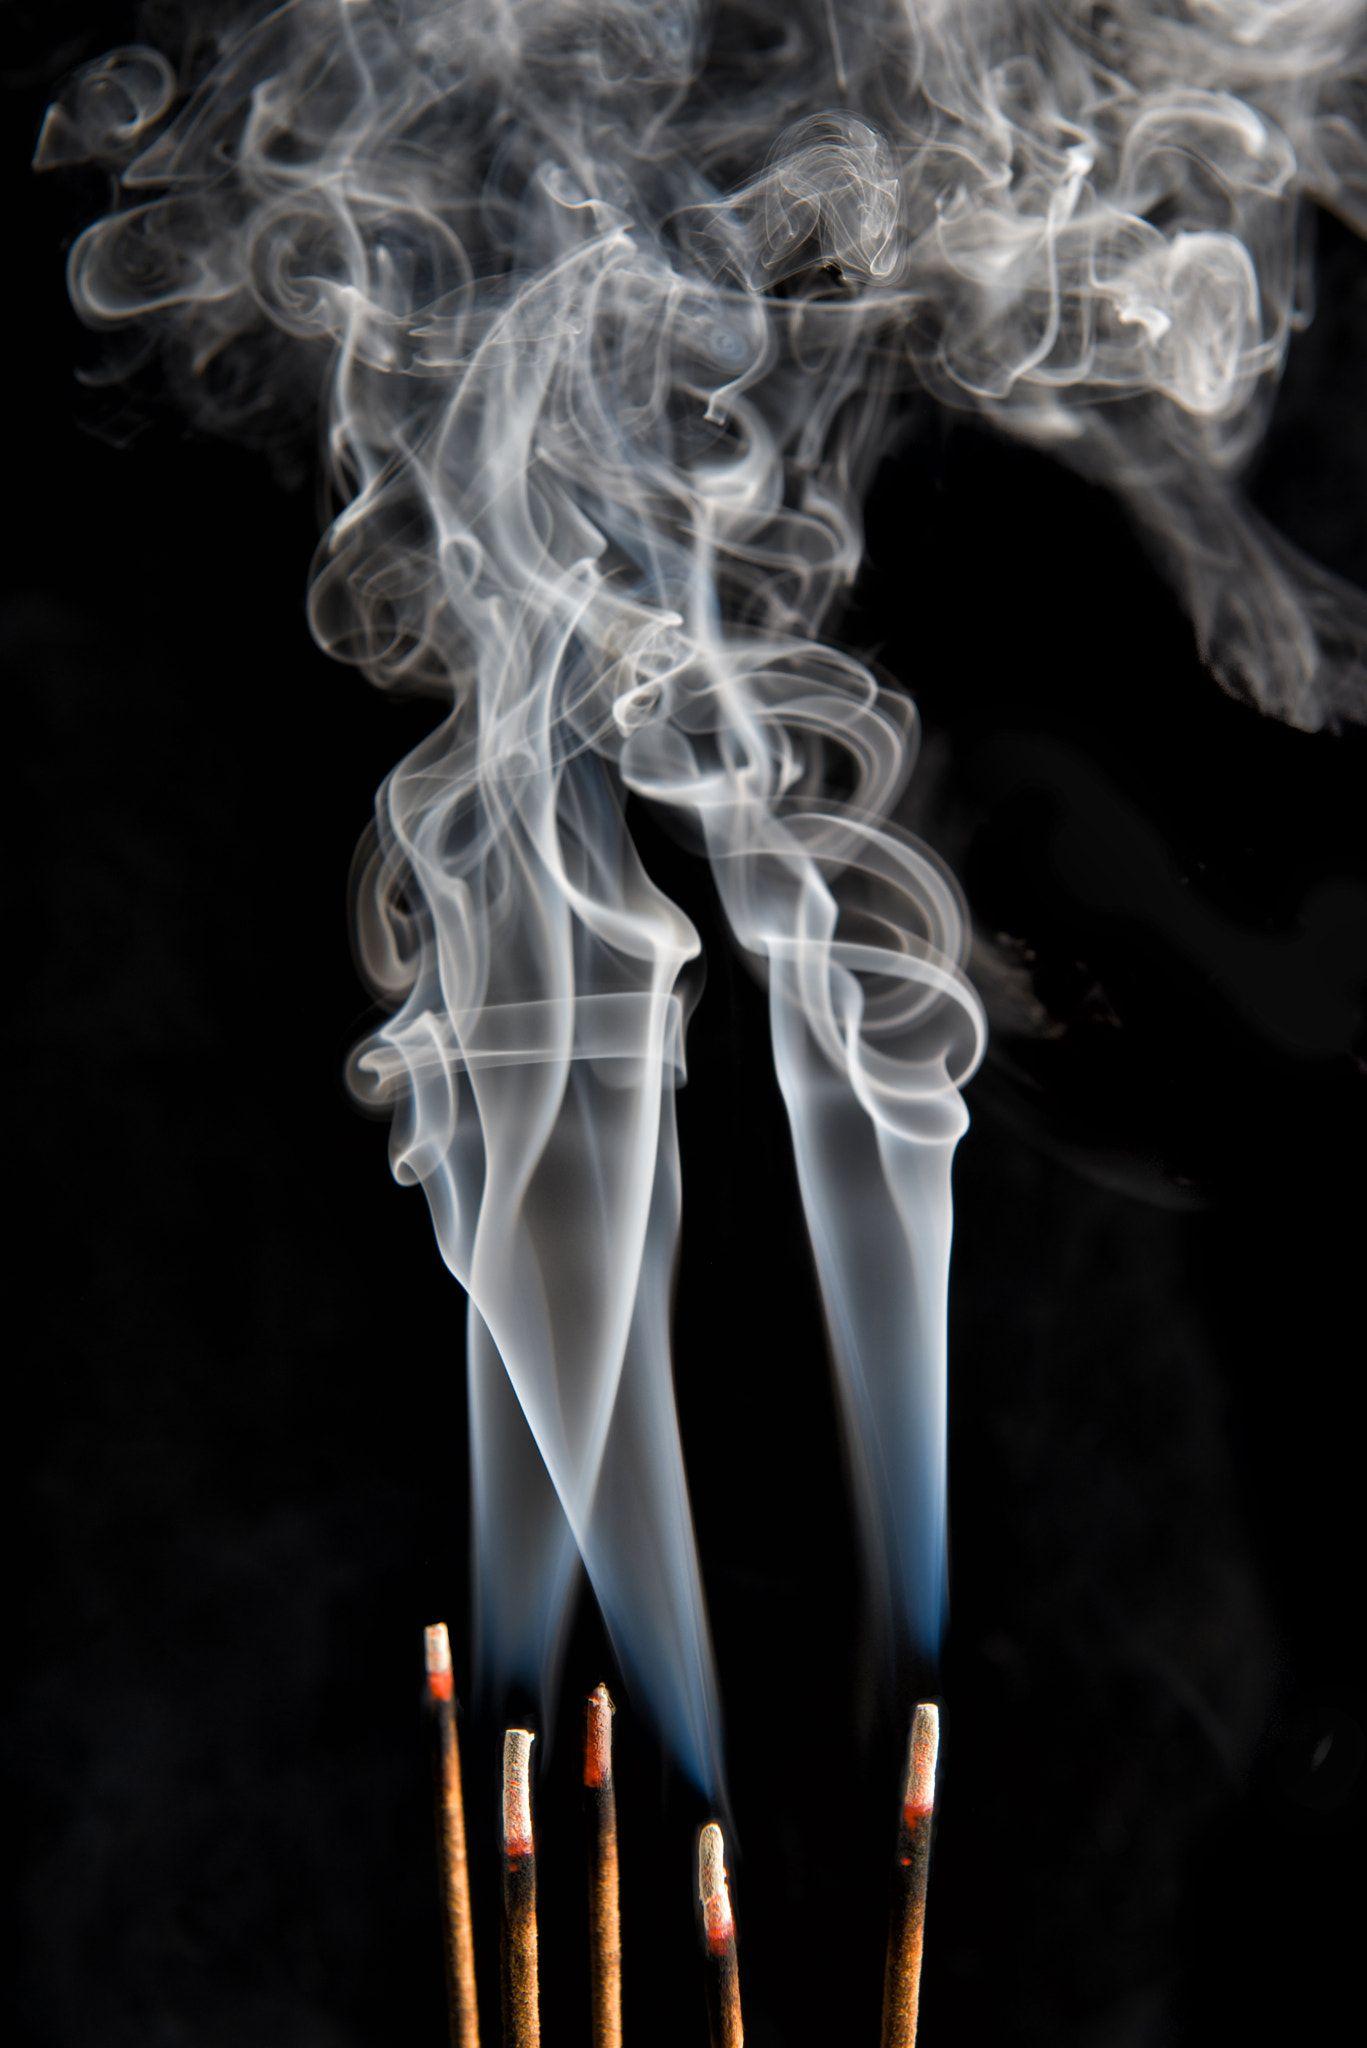 Incense Stick Smoke Photography